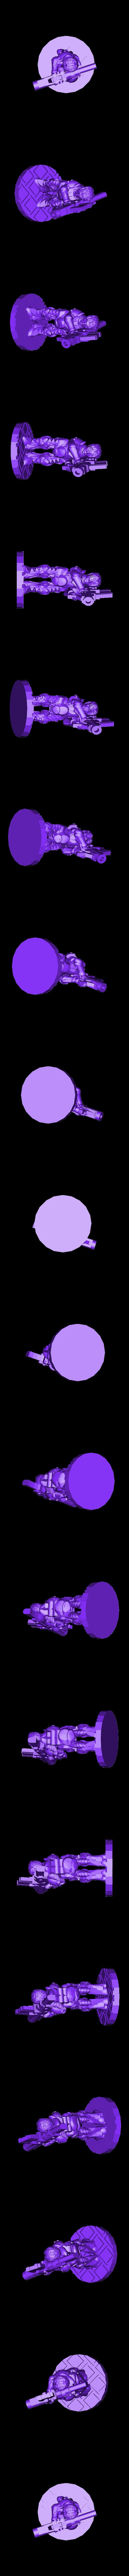 Cyberfemme Heavy Rocket Standing Aim.stl Download STL file Cyberfemme With Rocket Launcher • 3D print design, Ellie_Valkyrie